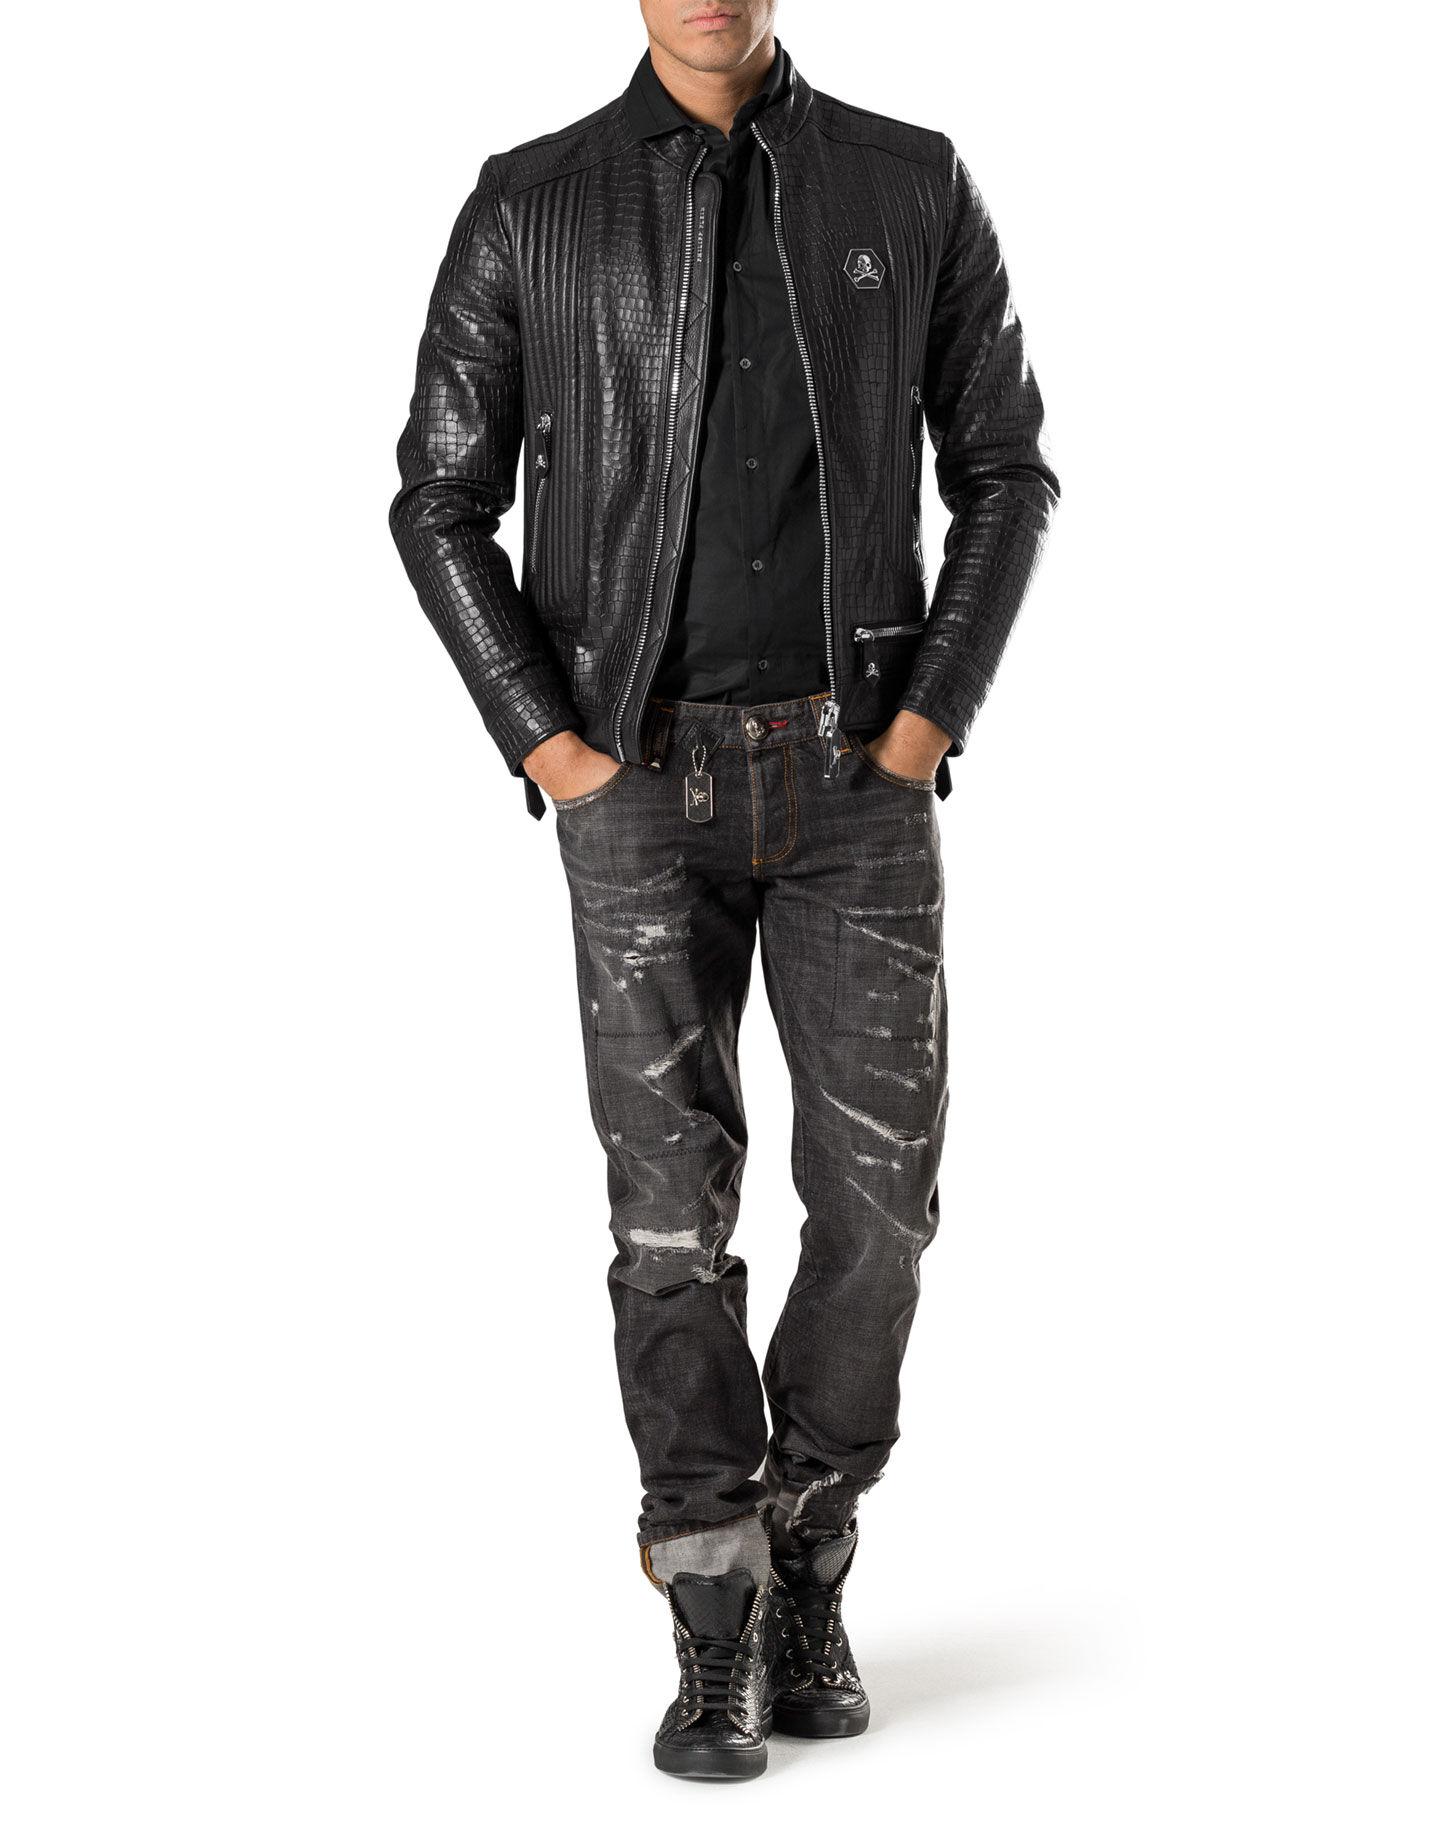 Philipp plein croco jacket